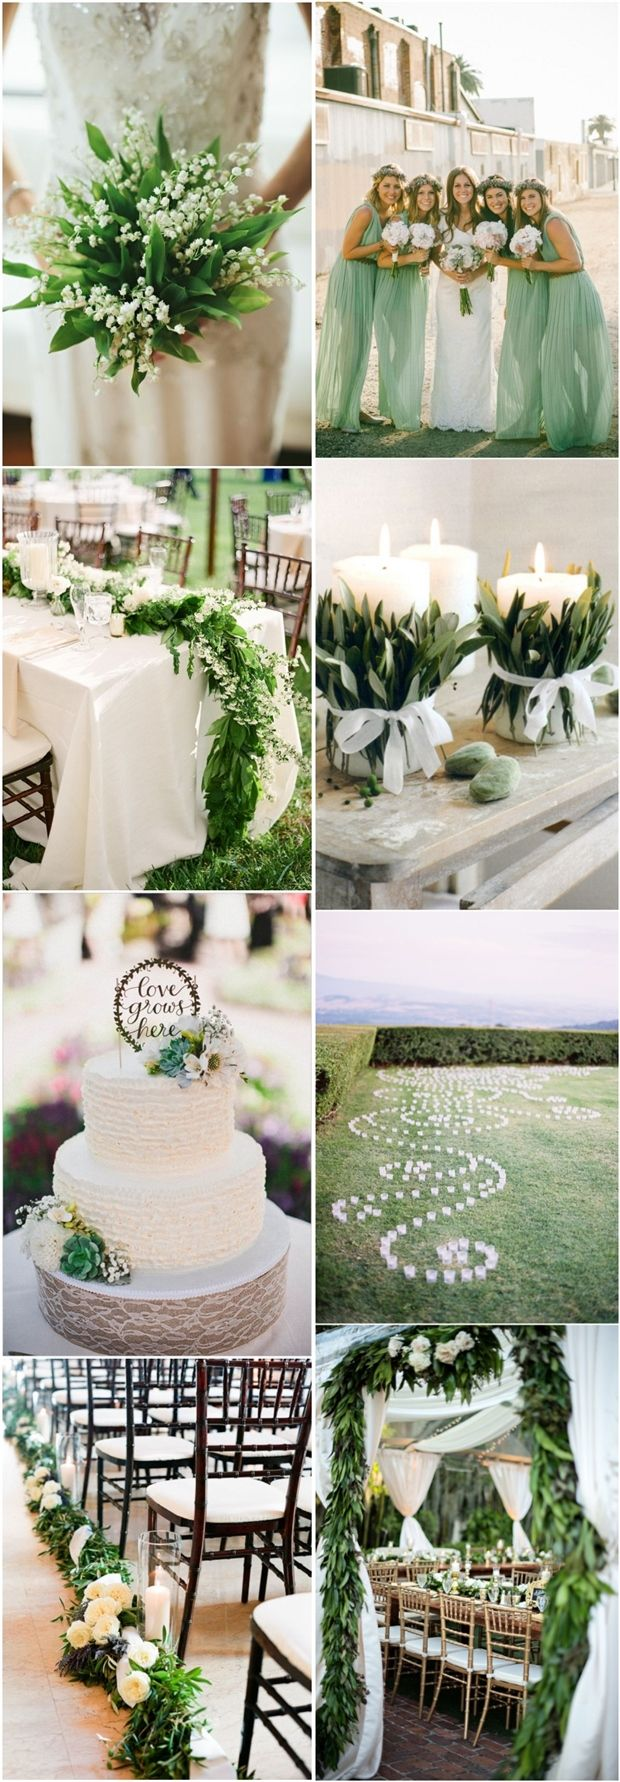 green wedding color ideas- spring wedding ideas - Deer Pearl Flowers